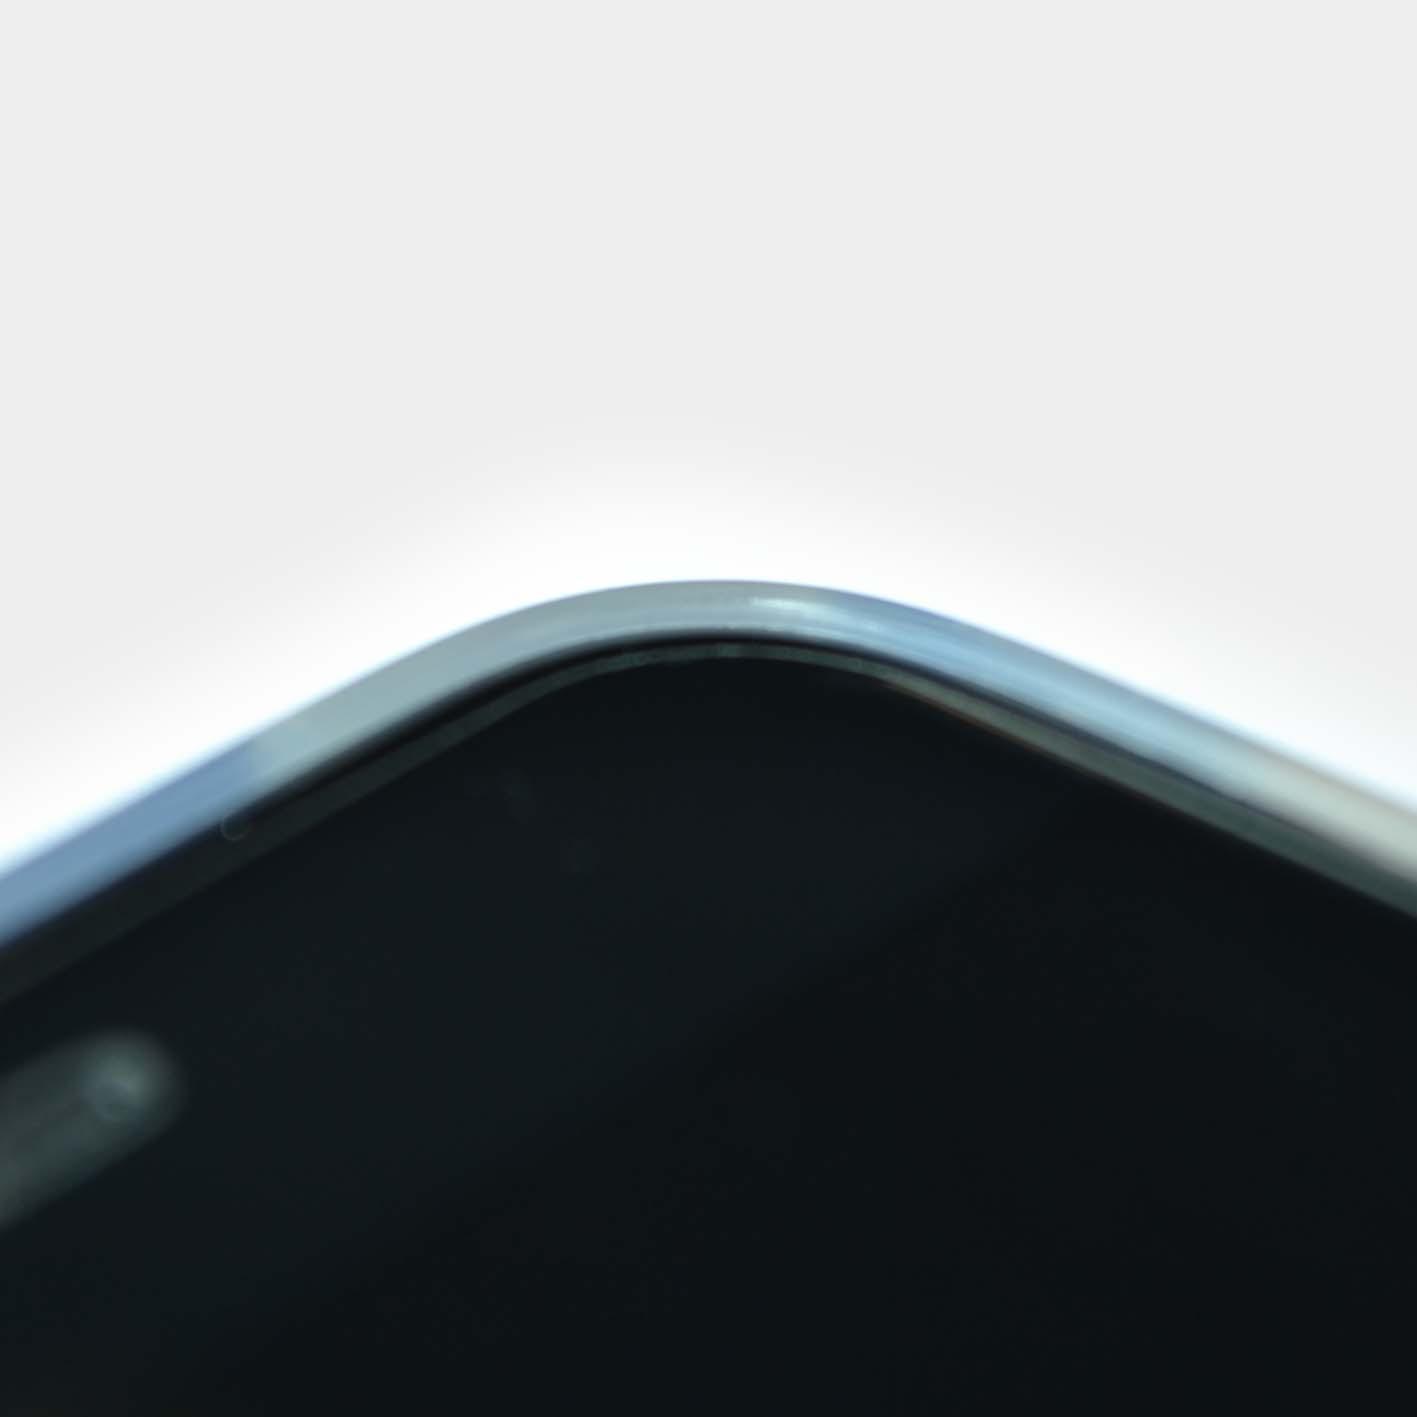 Coque-Gel-TPU-STUFF4-pour-OnePlus-5-Bleu-Playstation-PS4